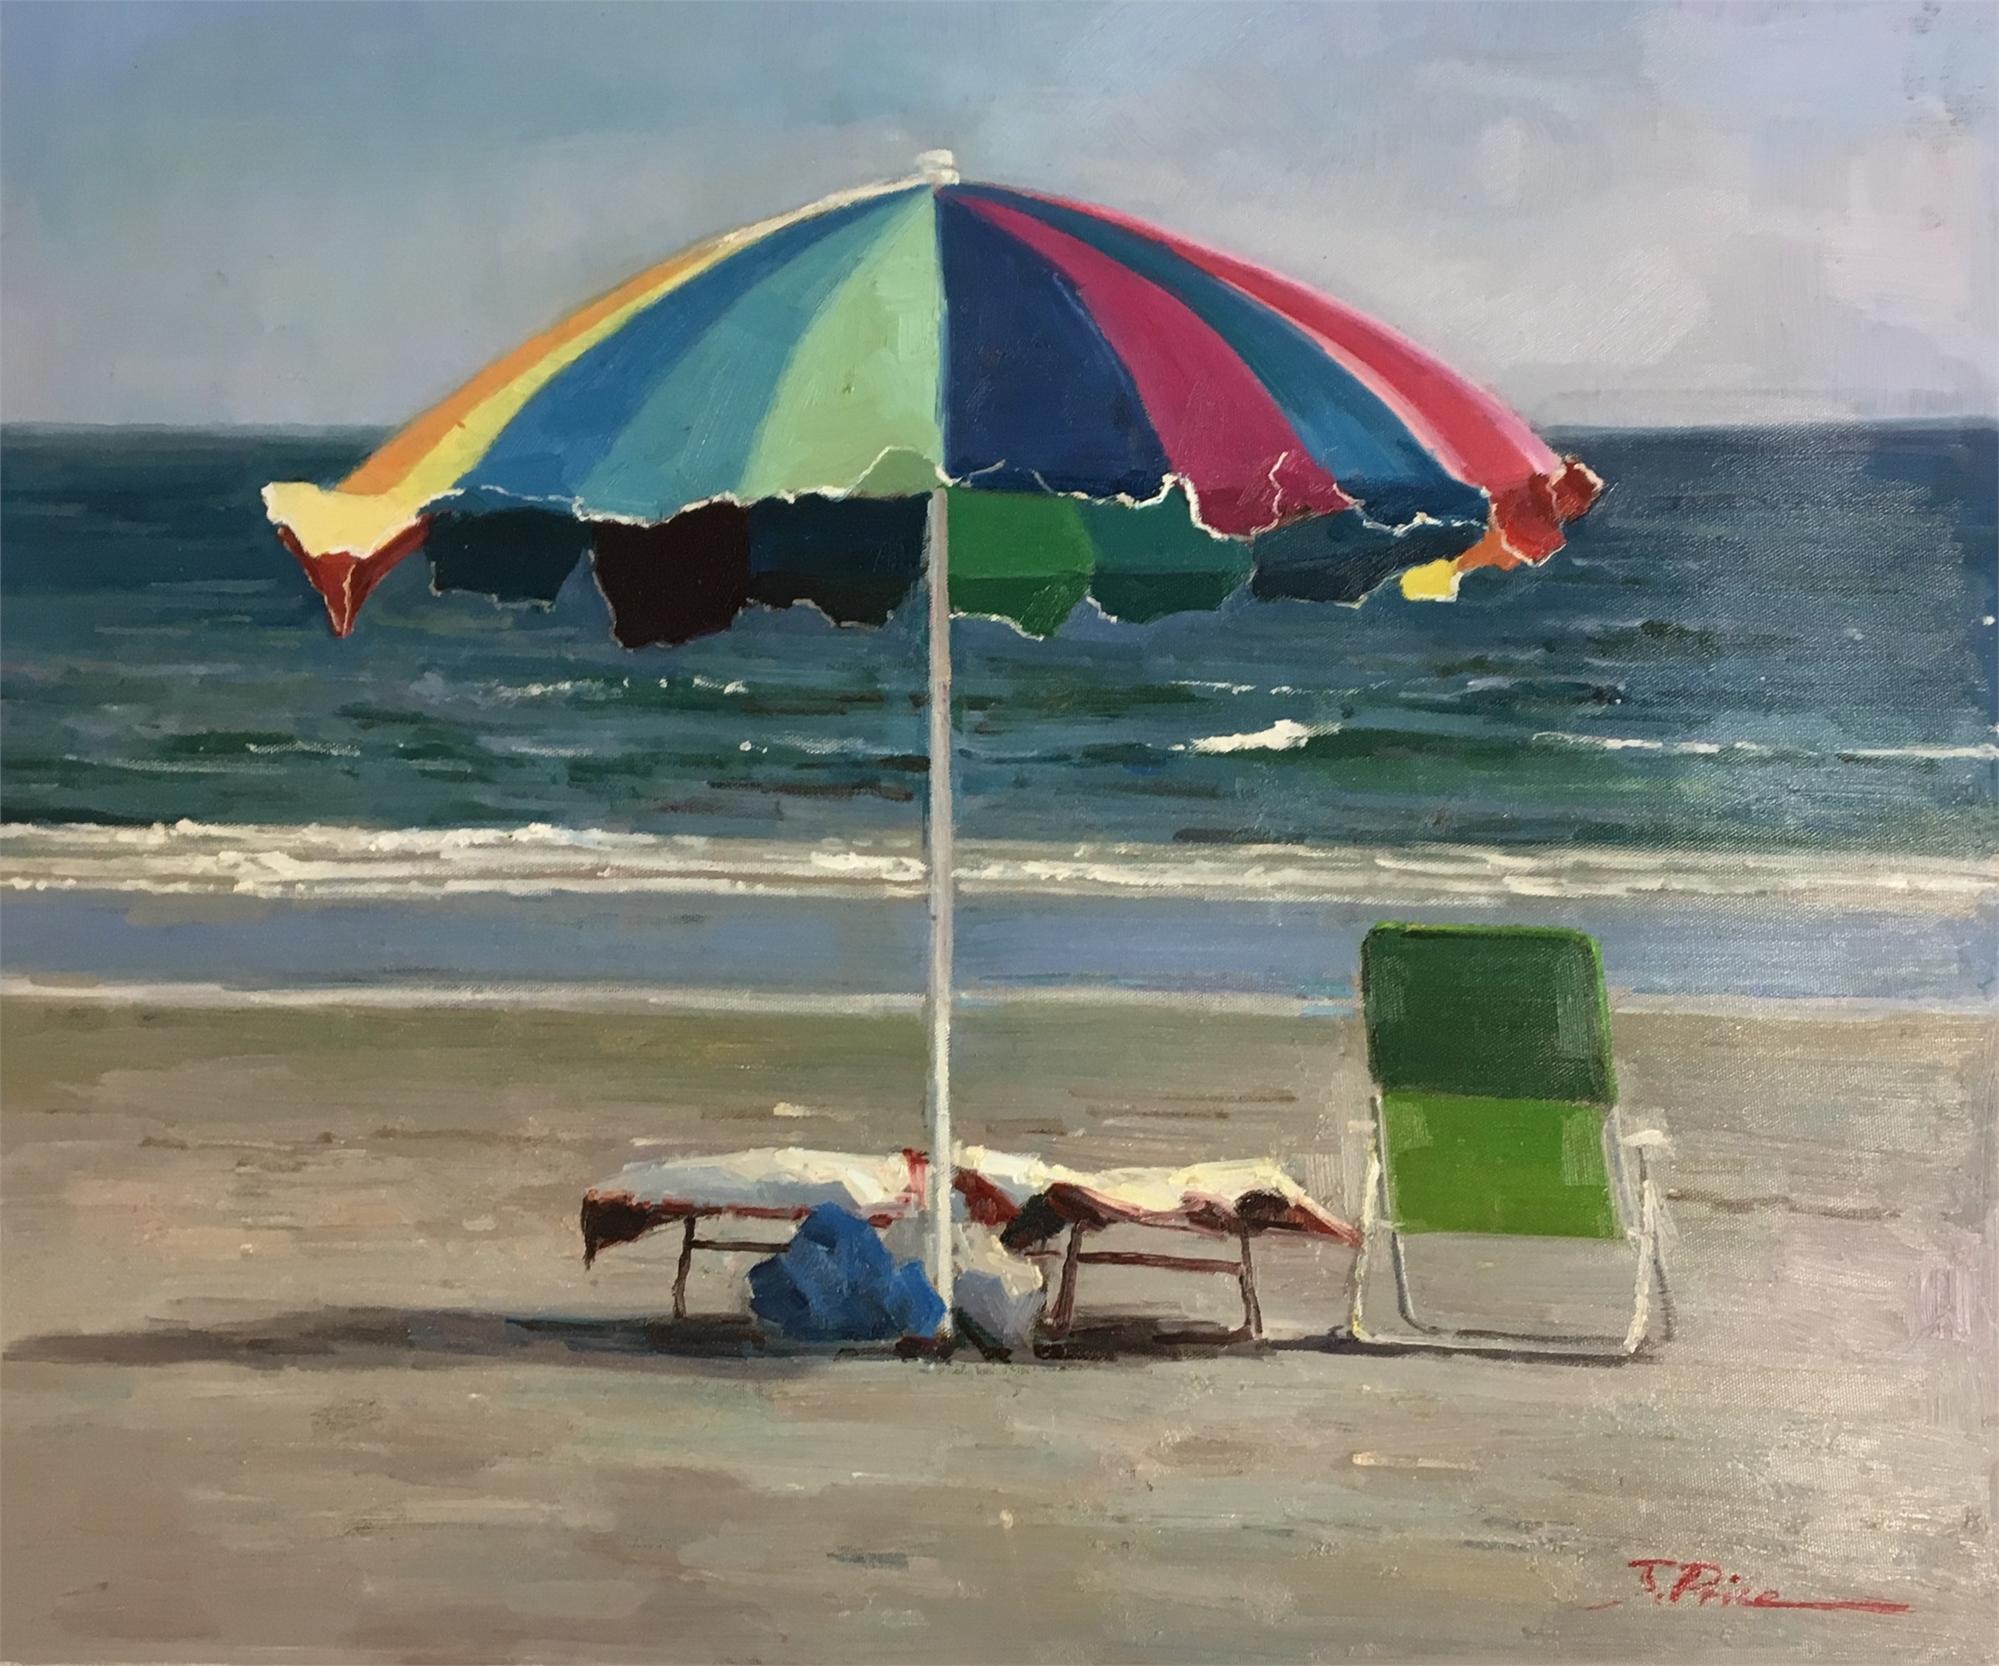 BEACH UMBRELLA by J PRICE